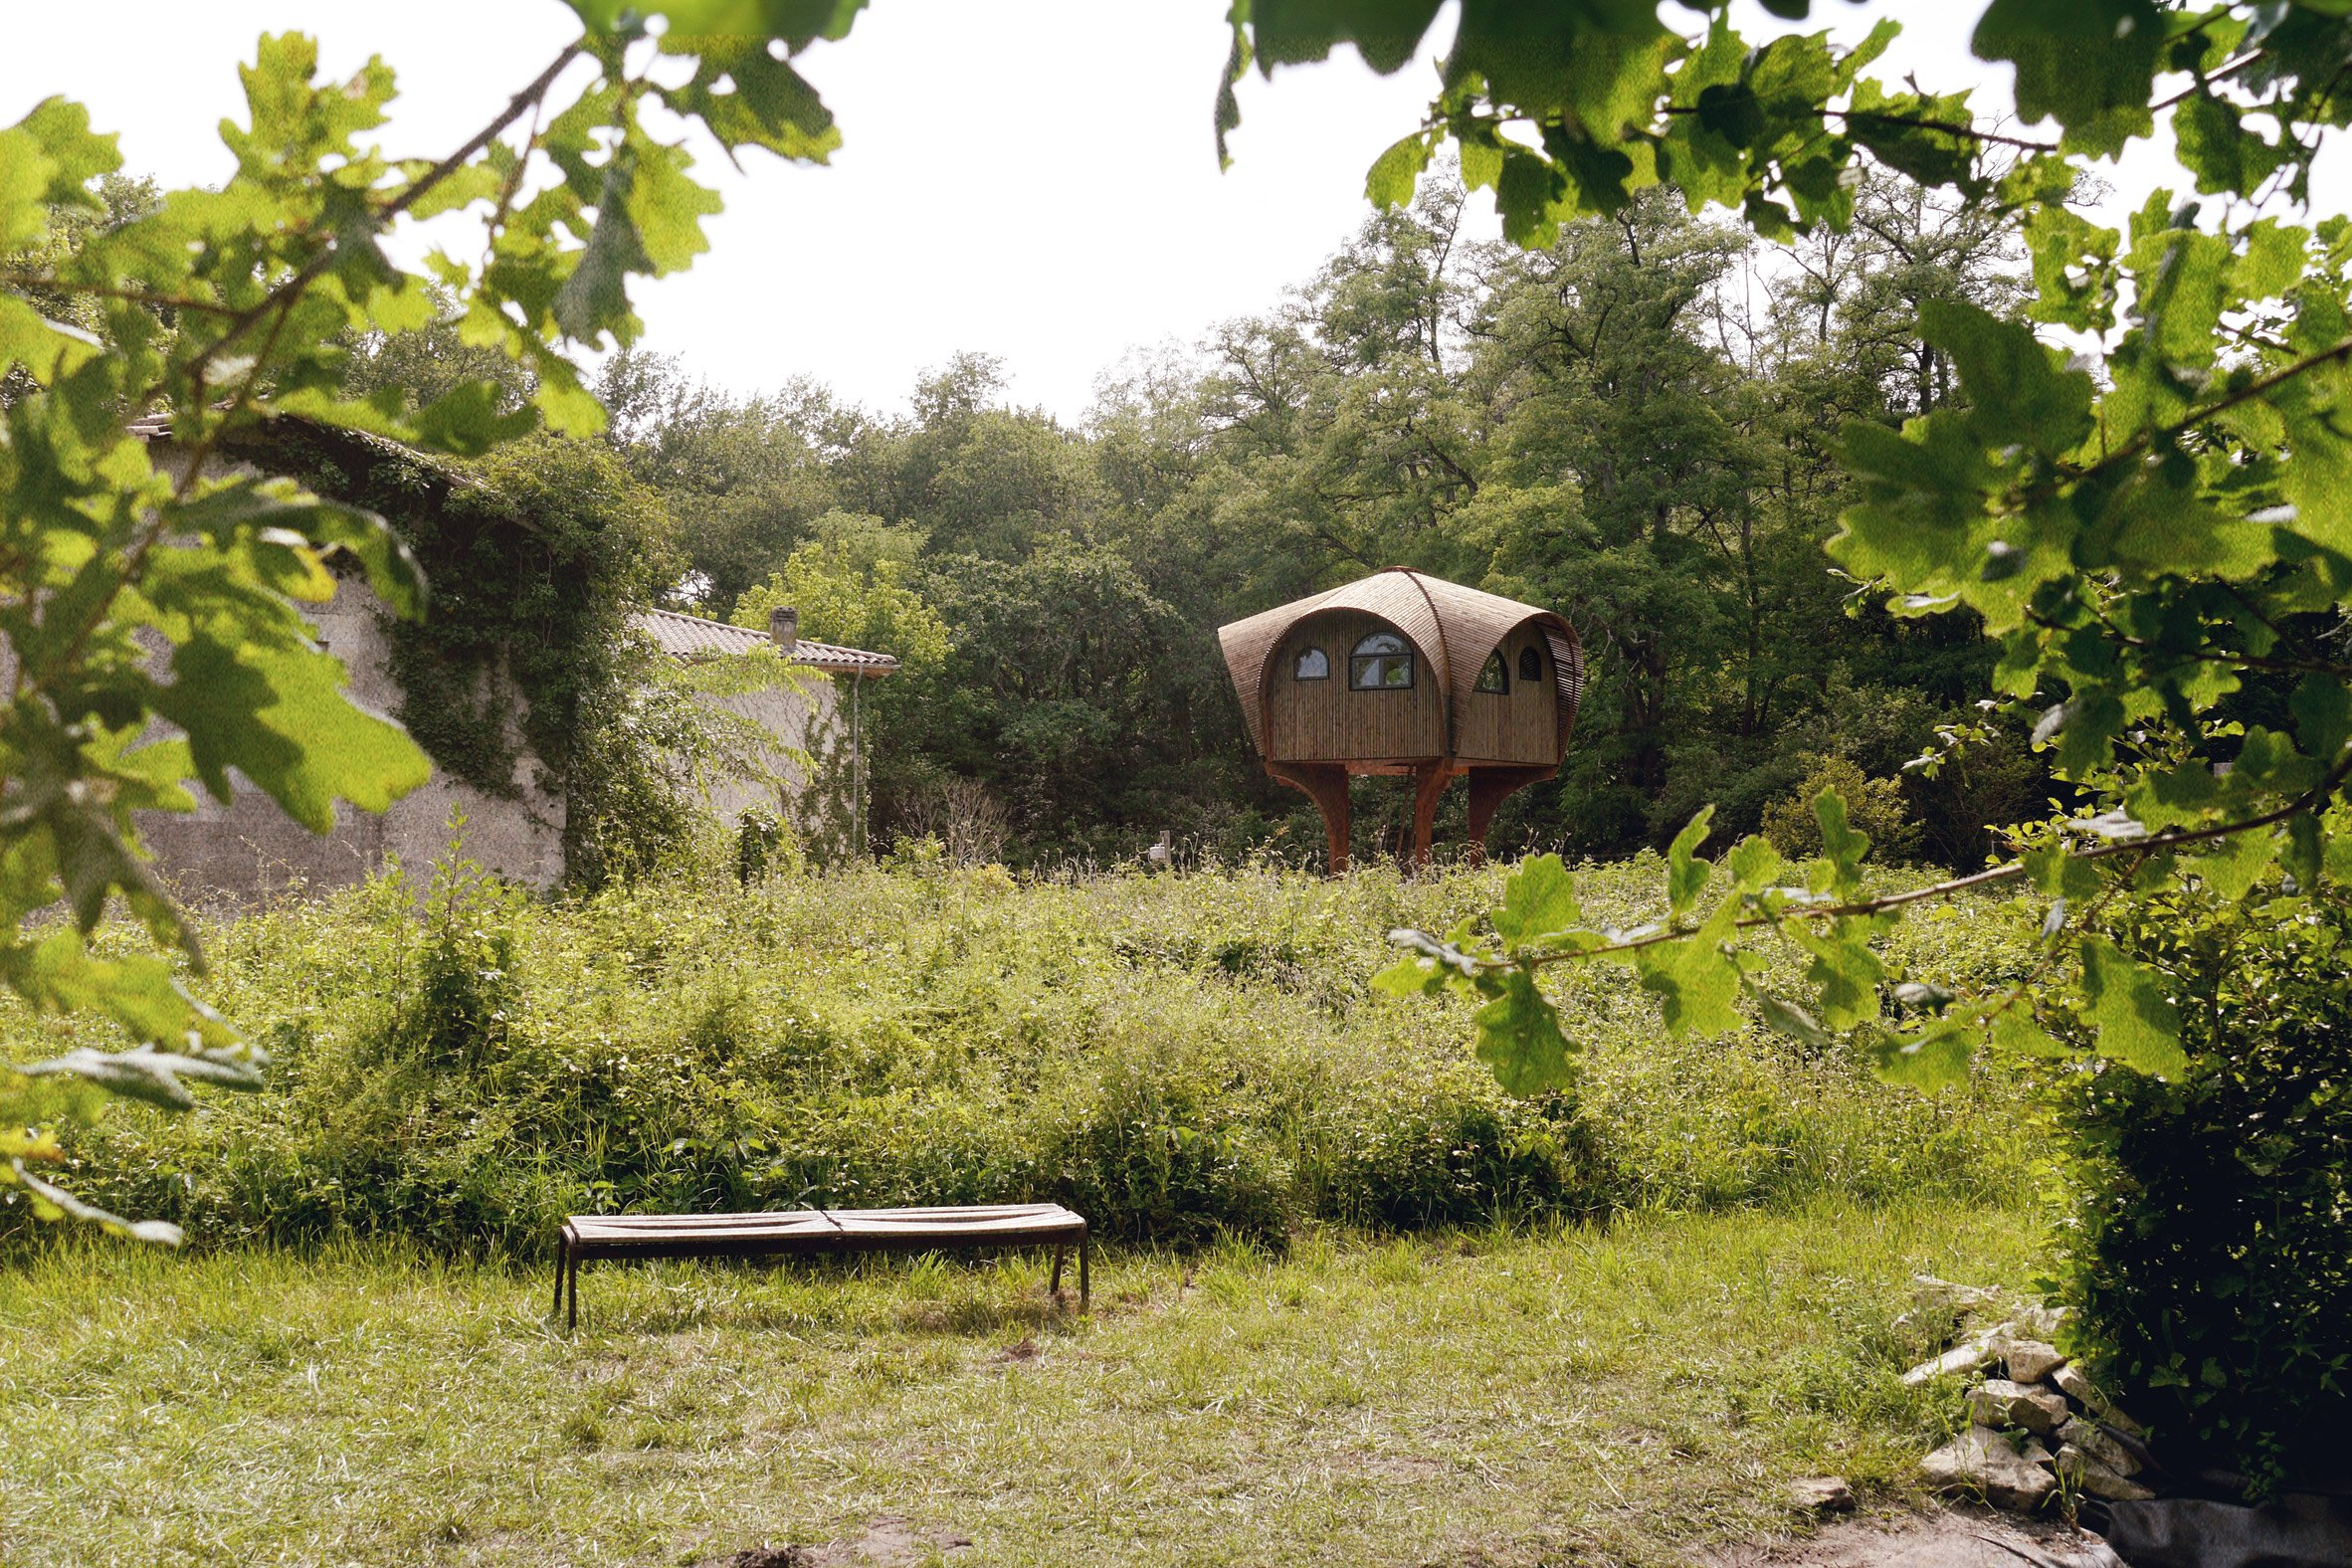 Studio Weave installs stilted hikers' shelter beside a Bordeaux river